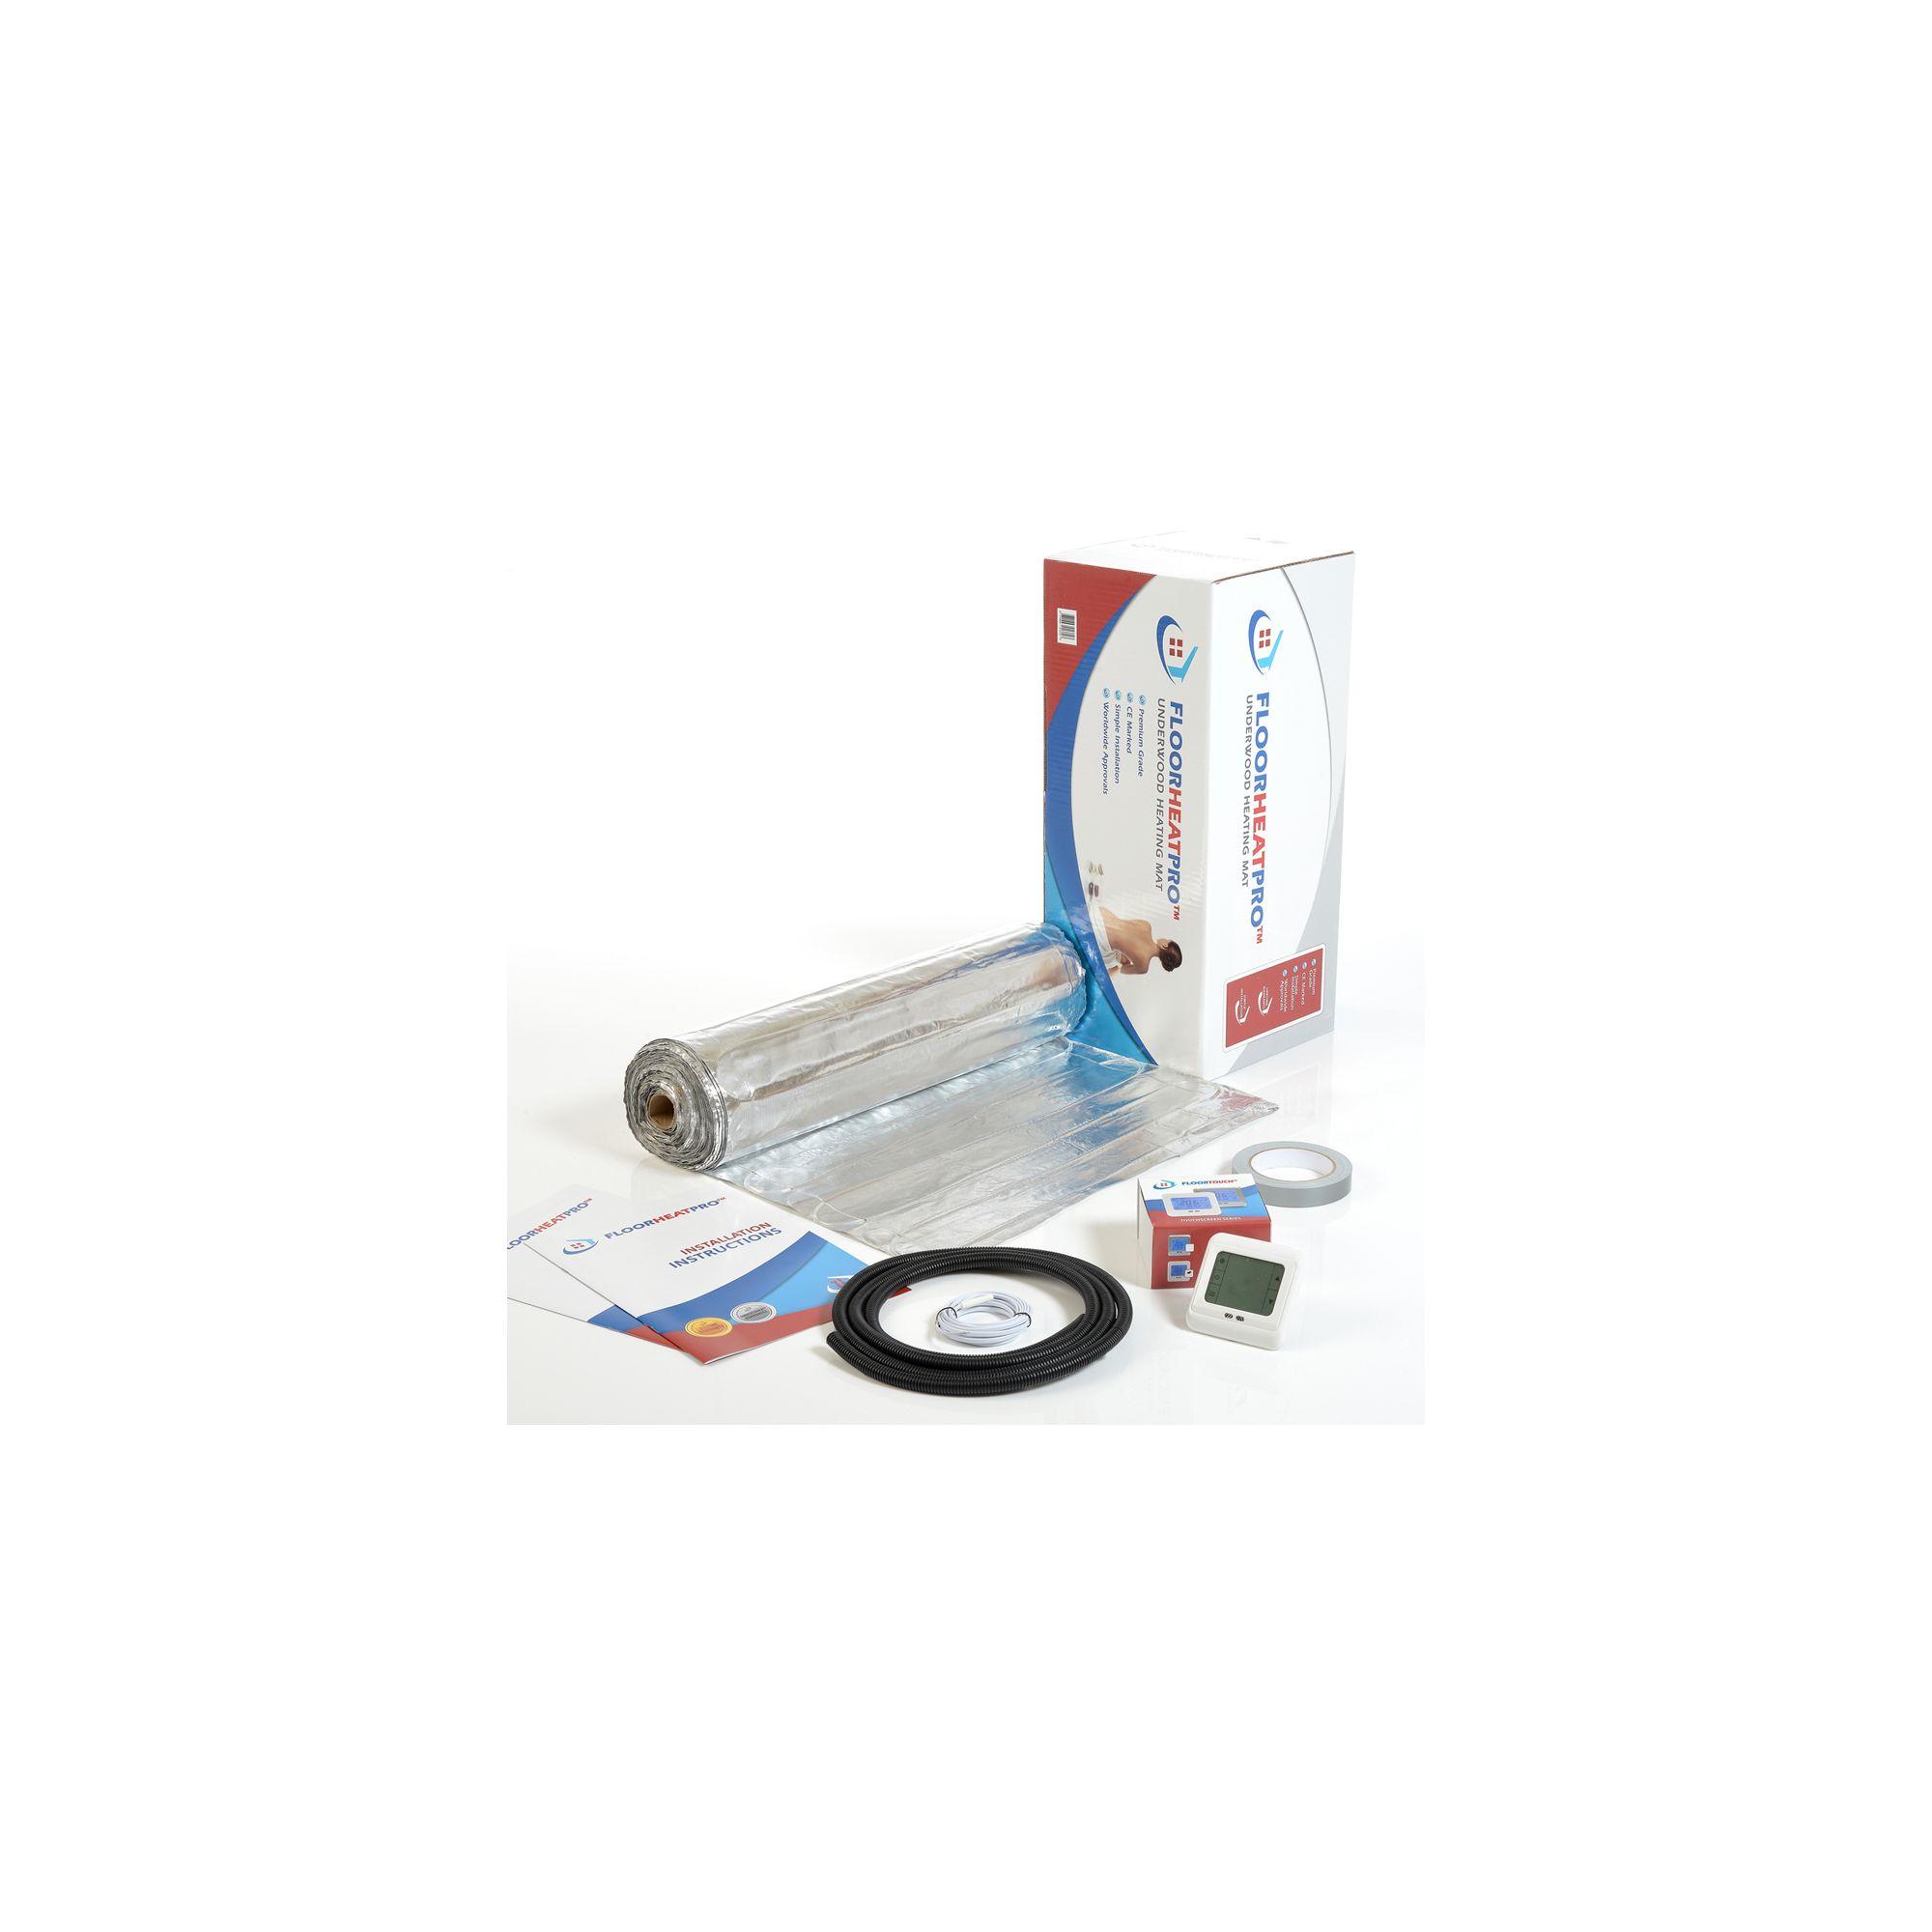 19.0 m2 - Underfloor Electric Heating Kit - Laminate at Tesco Direct